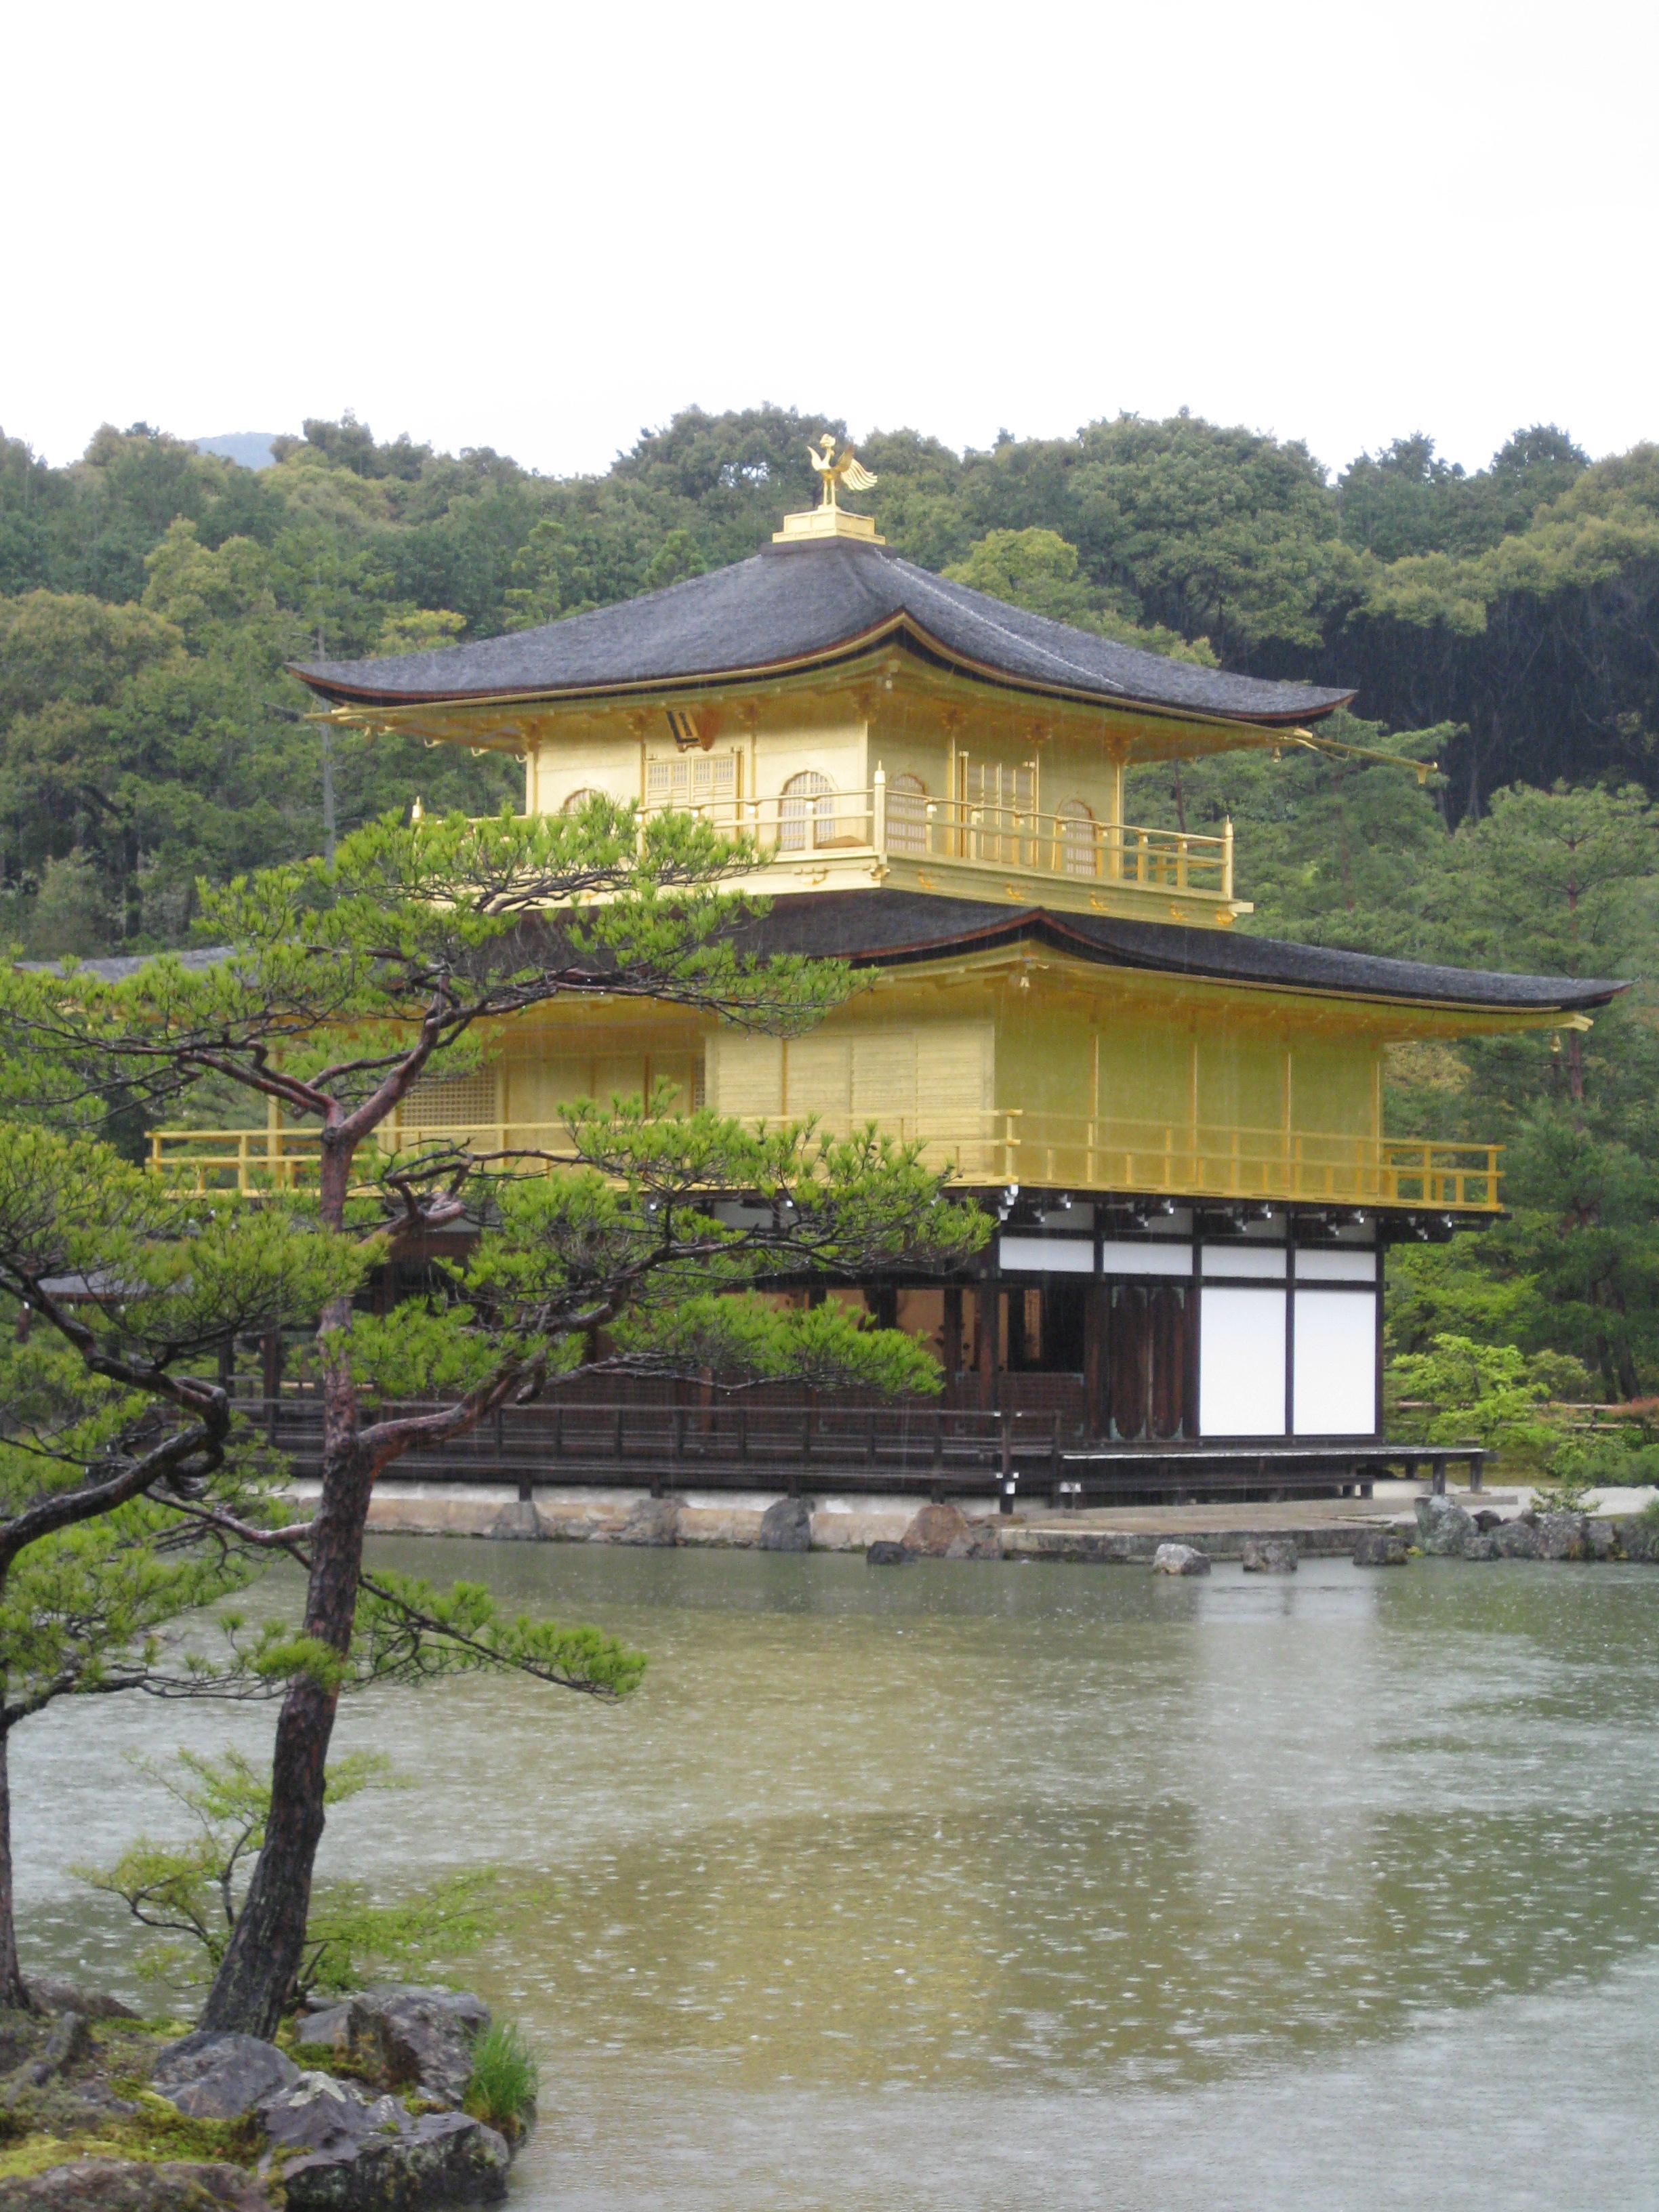 Travelling to japan an interior design student s - Harrington institute of interior design ...